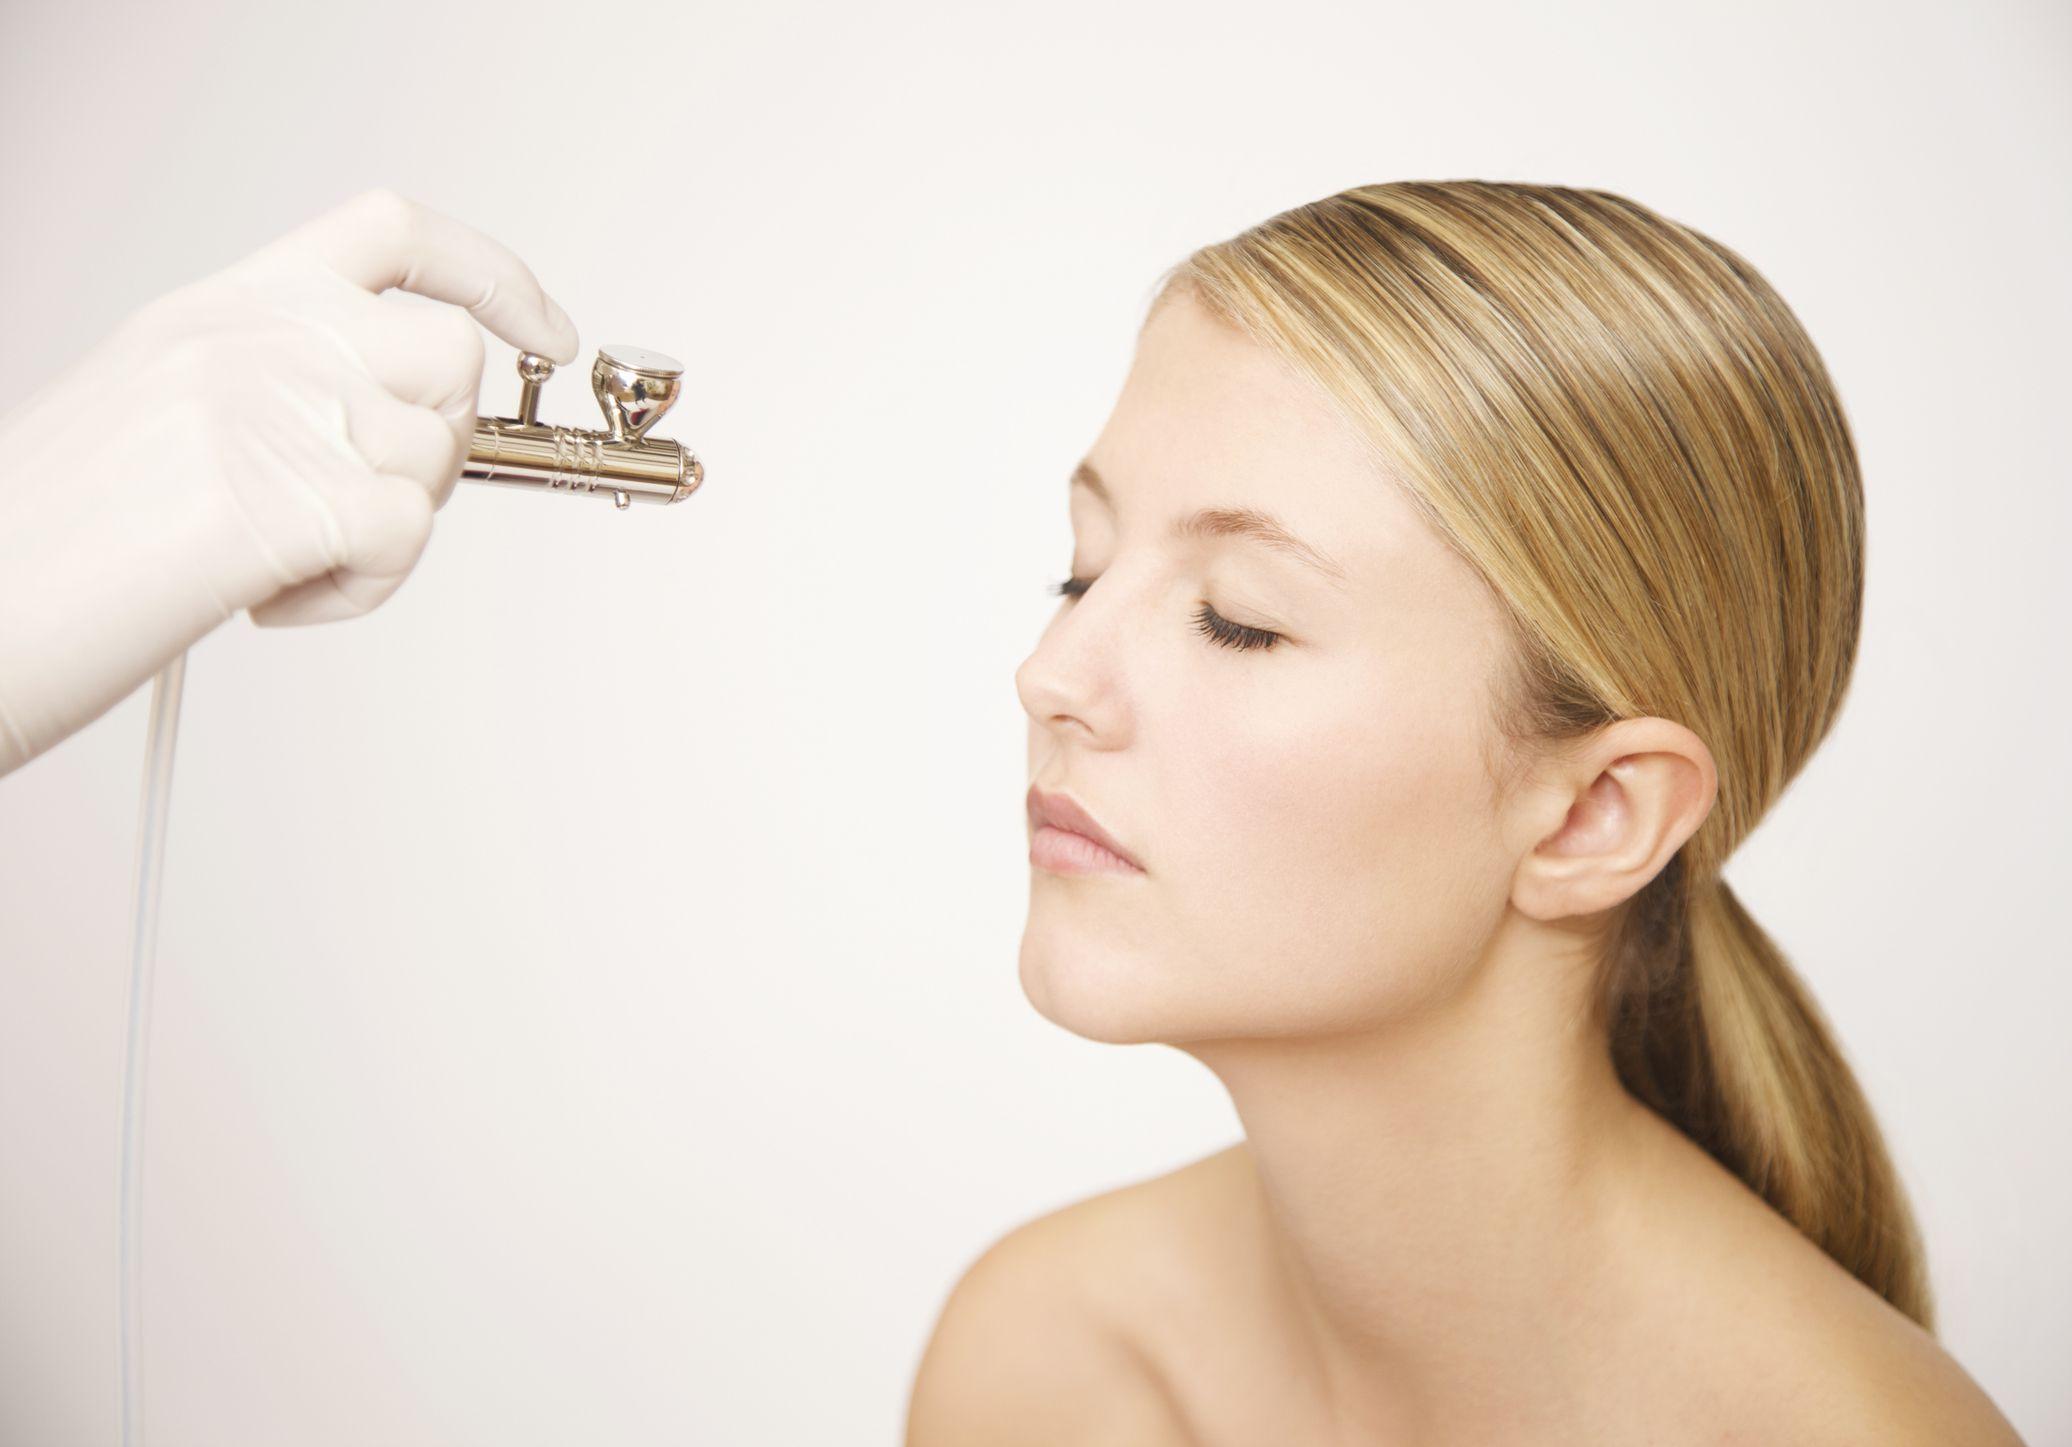 A woman getting a spray tan